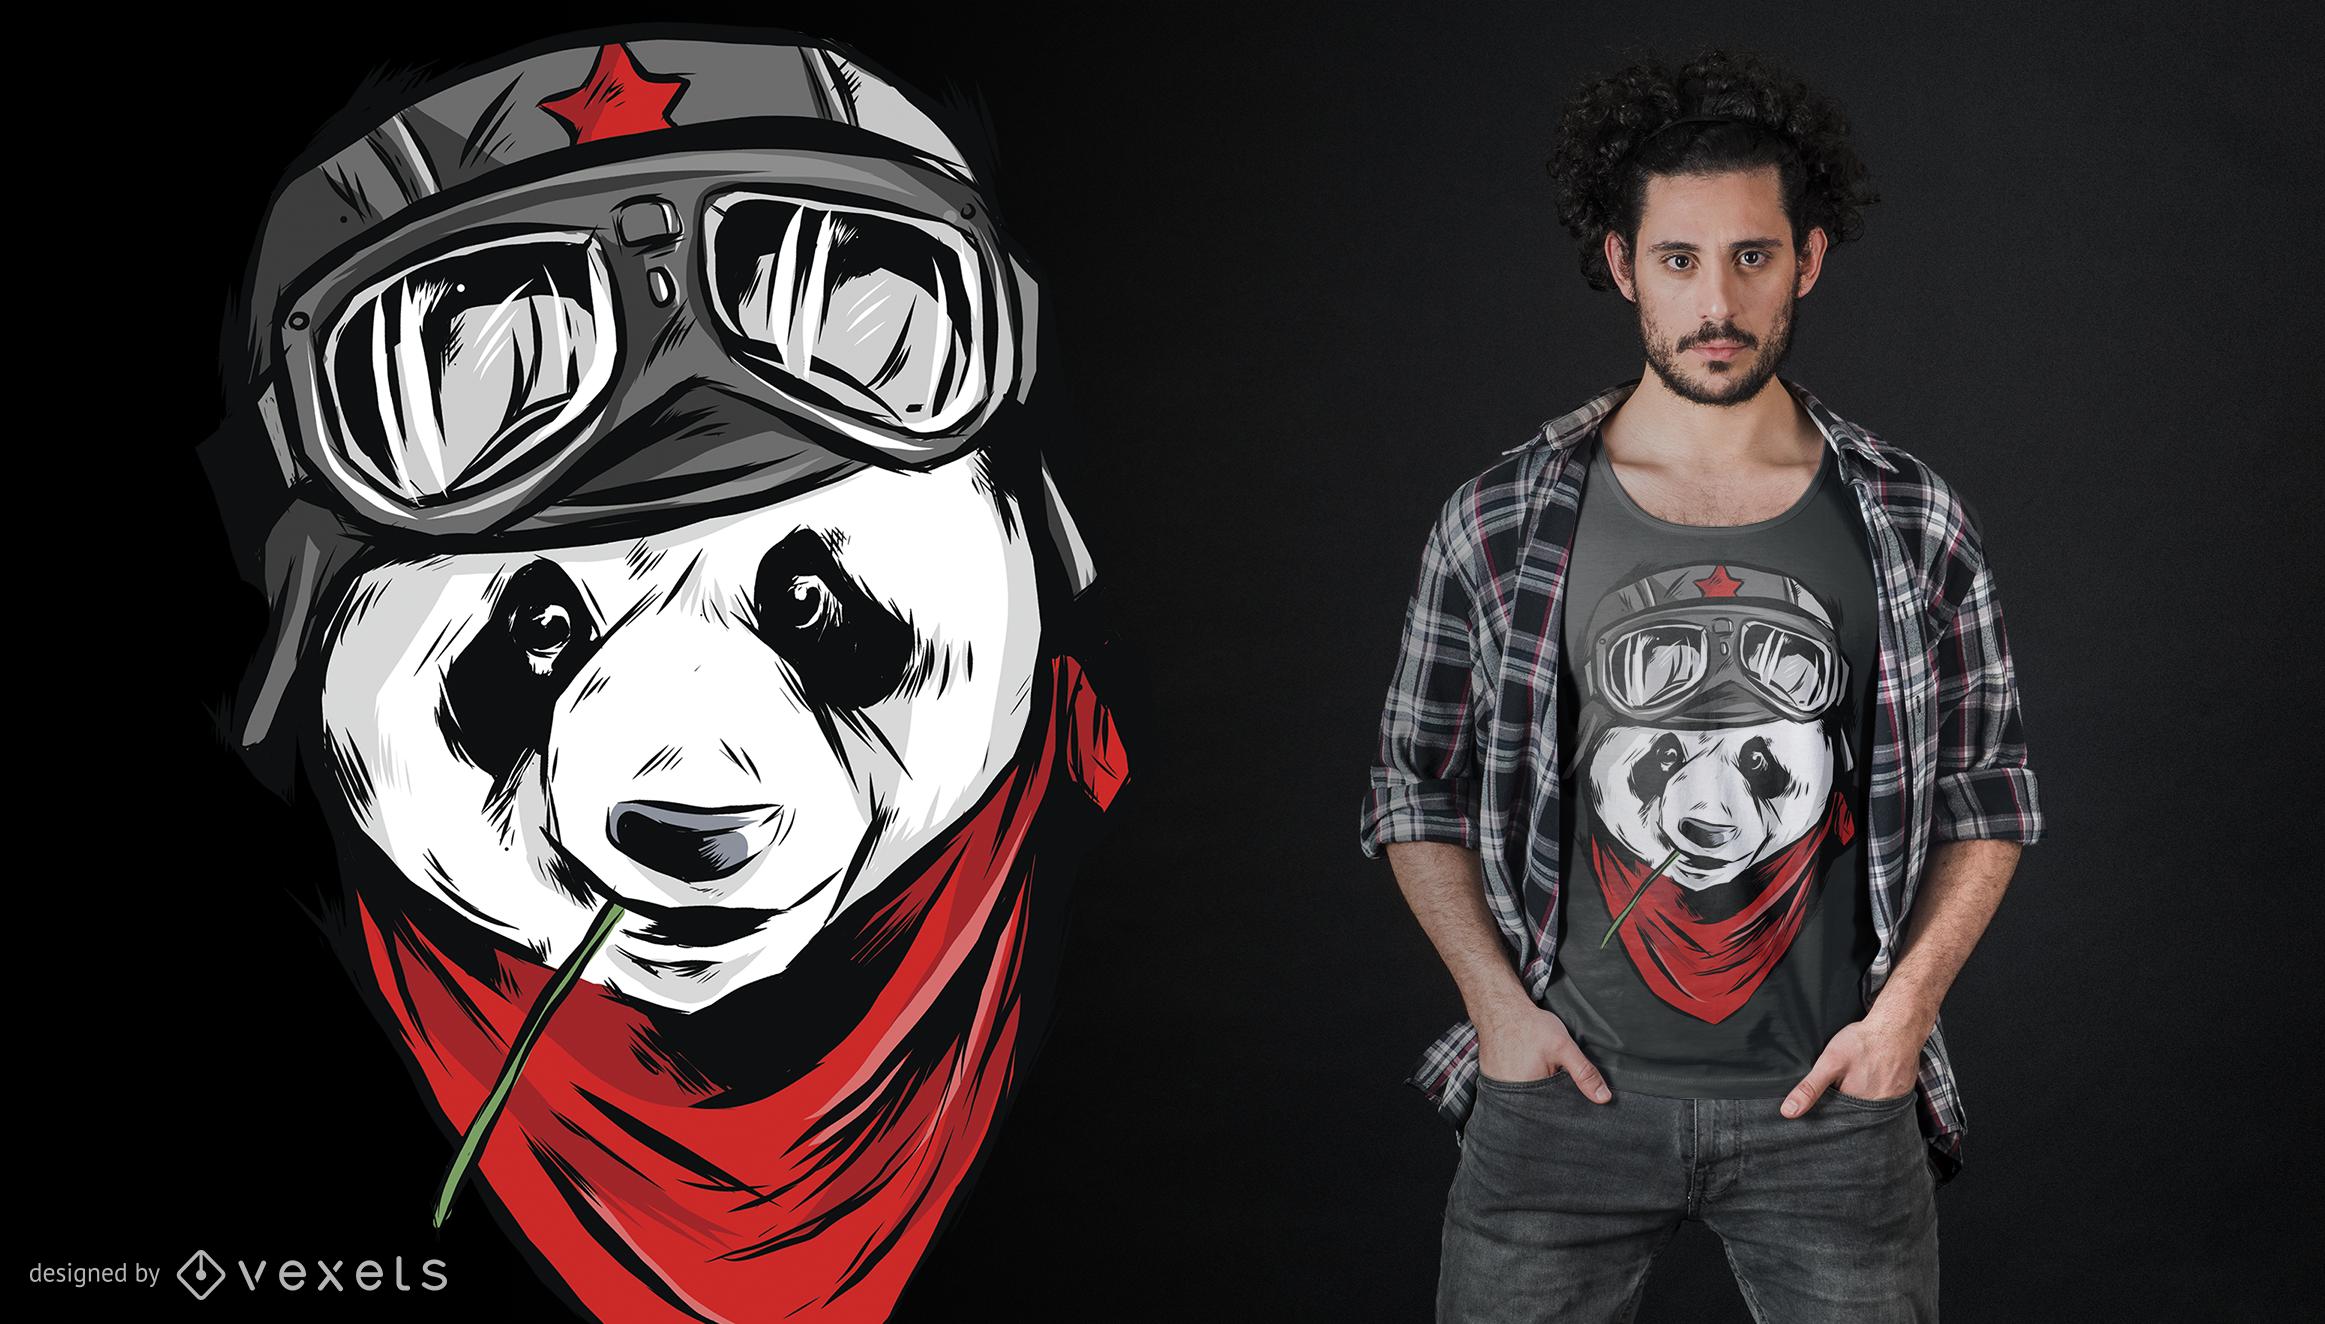 Cool Panda T-Shirt Design